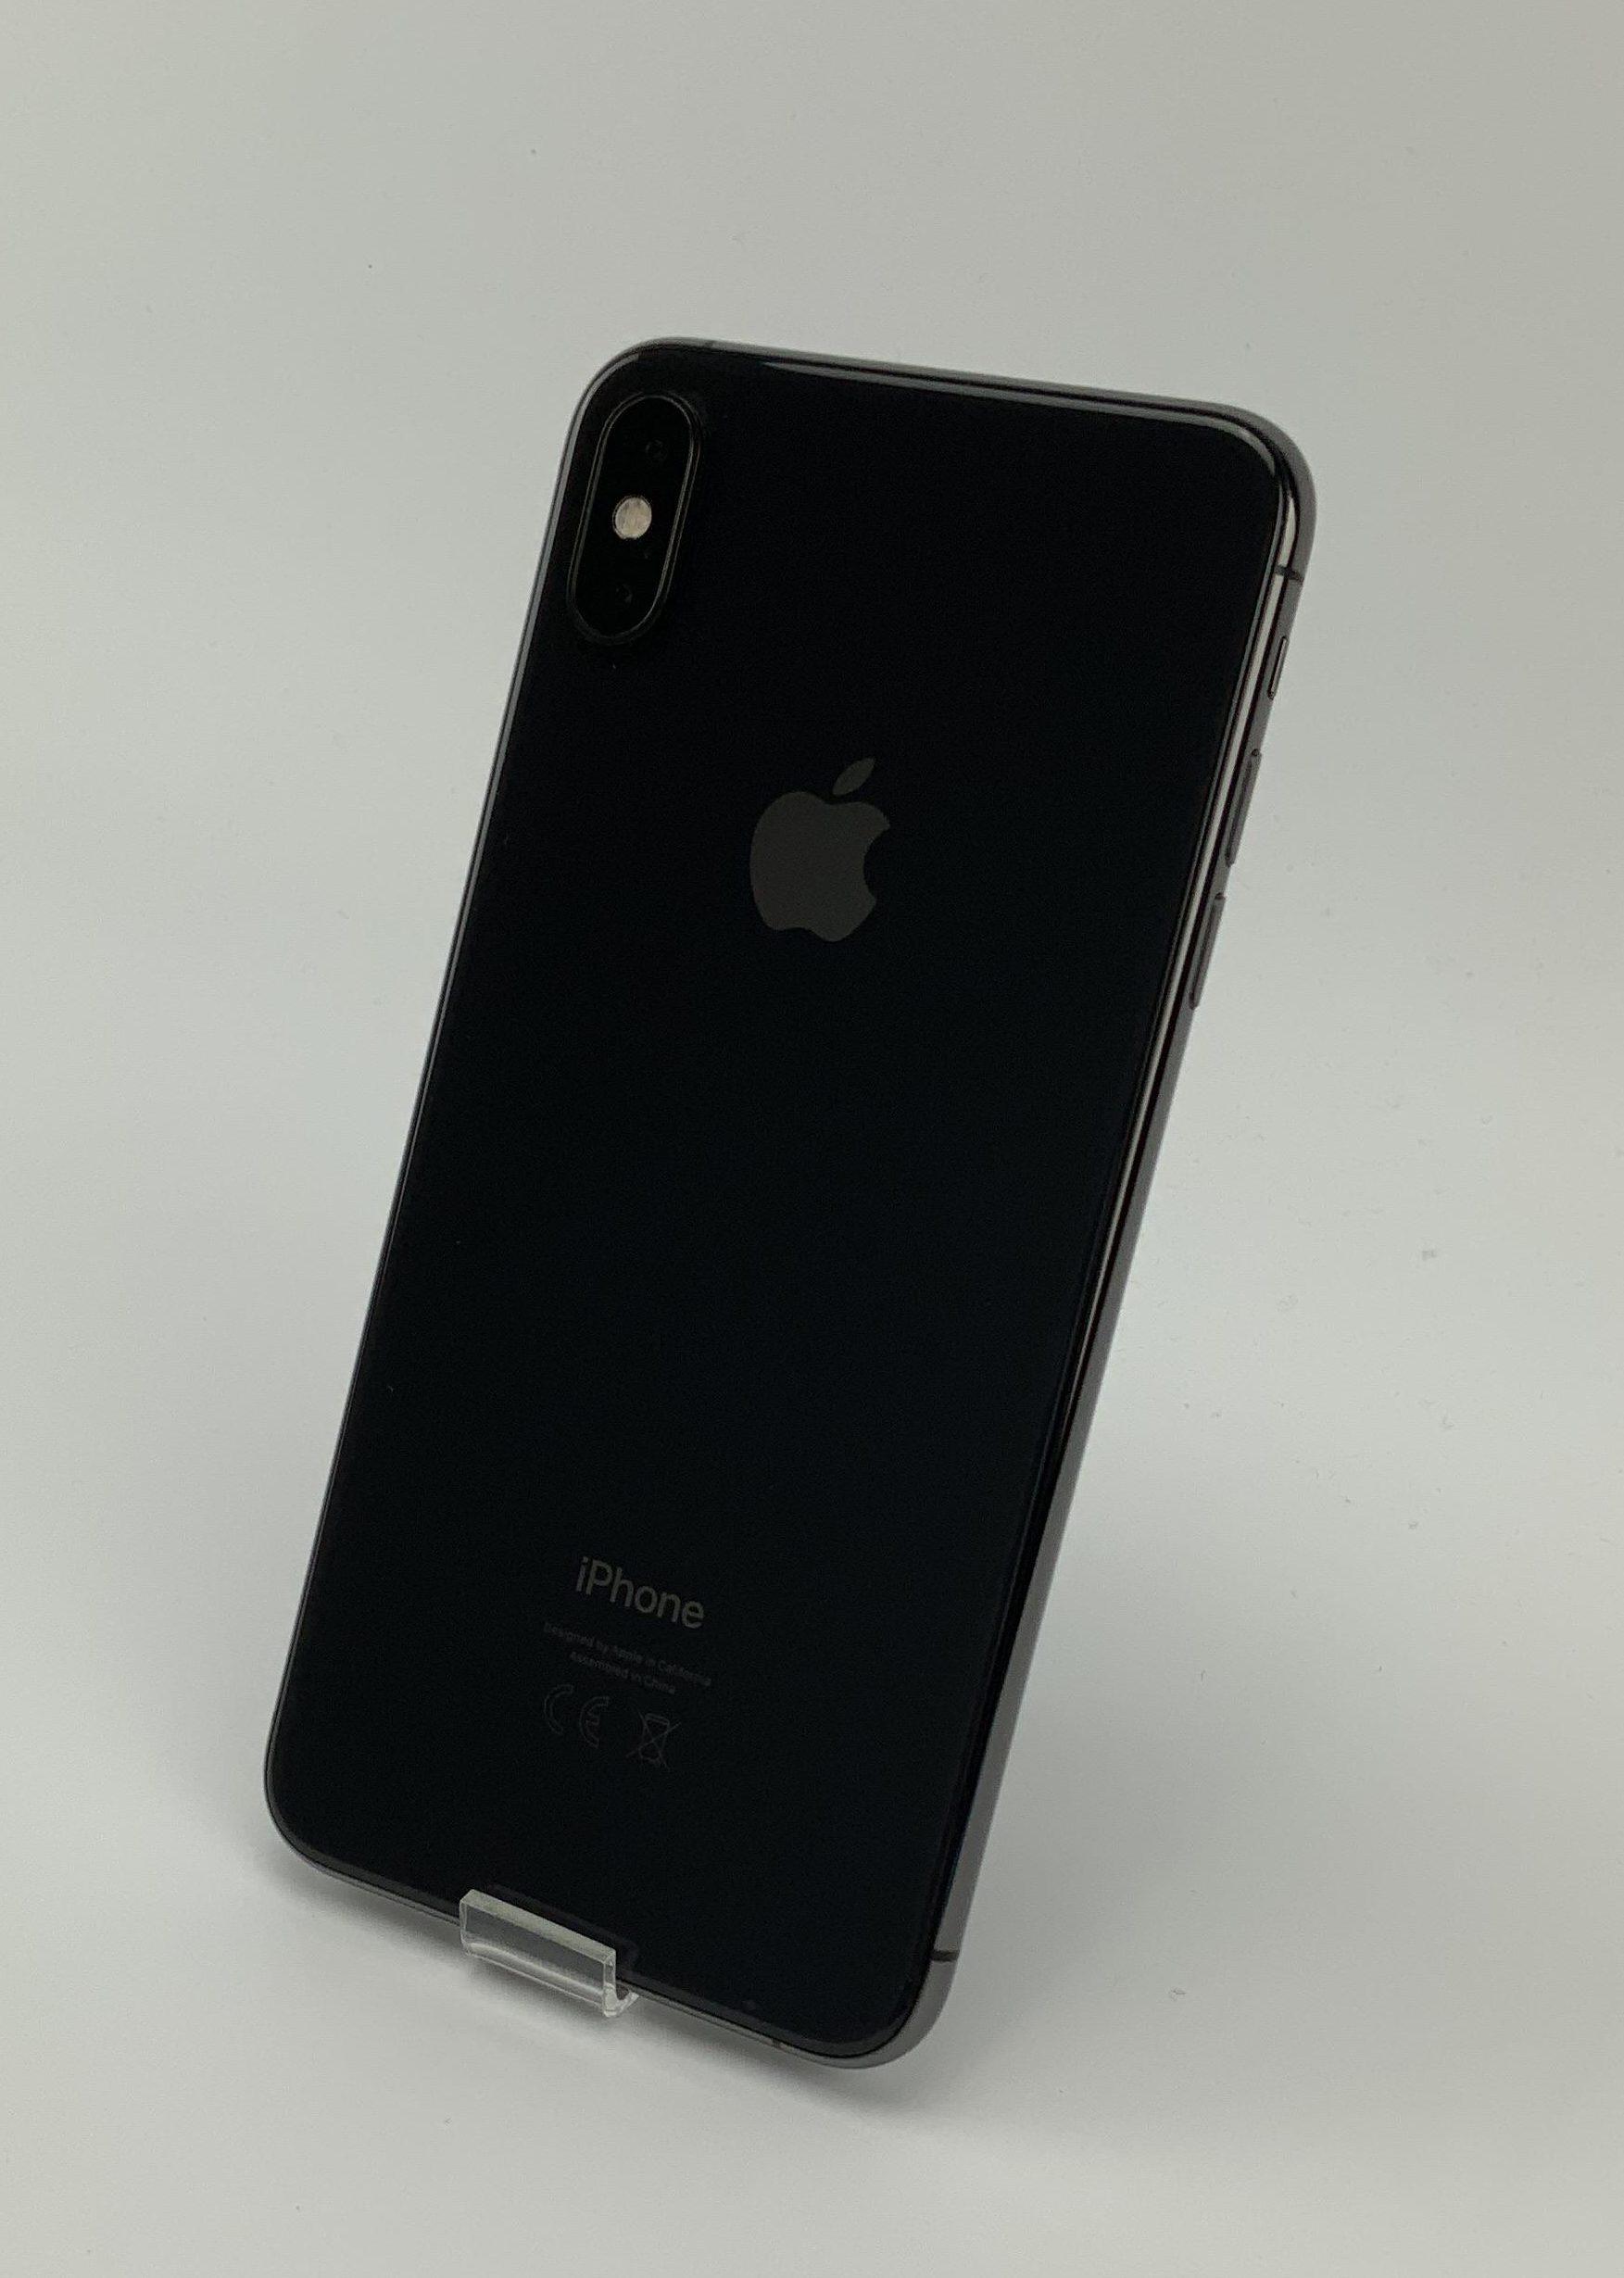 iPhone XS Max 256GB, 256GB, Space Gray, imagen 2